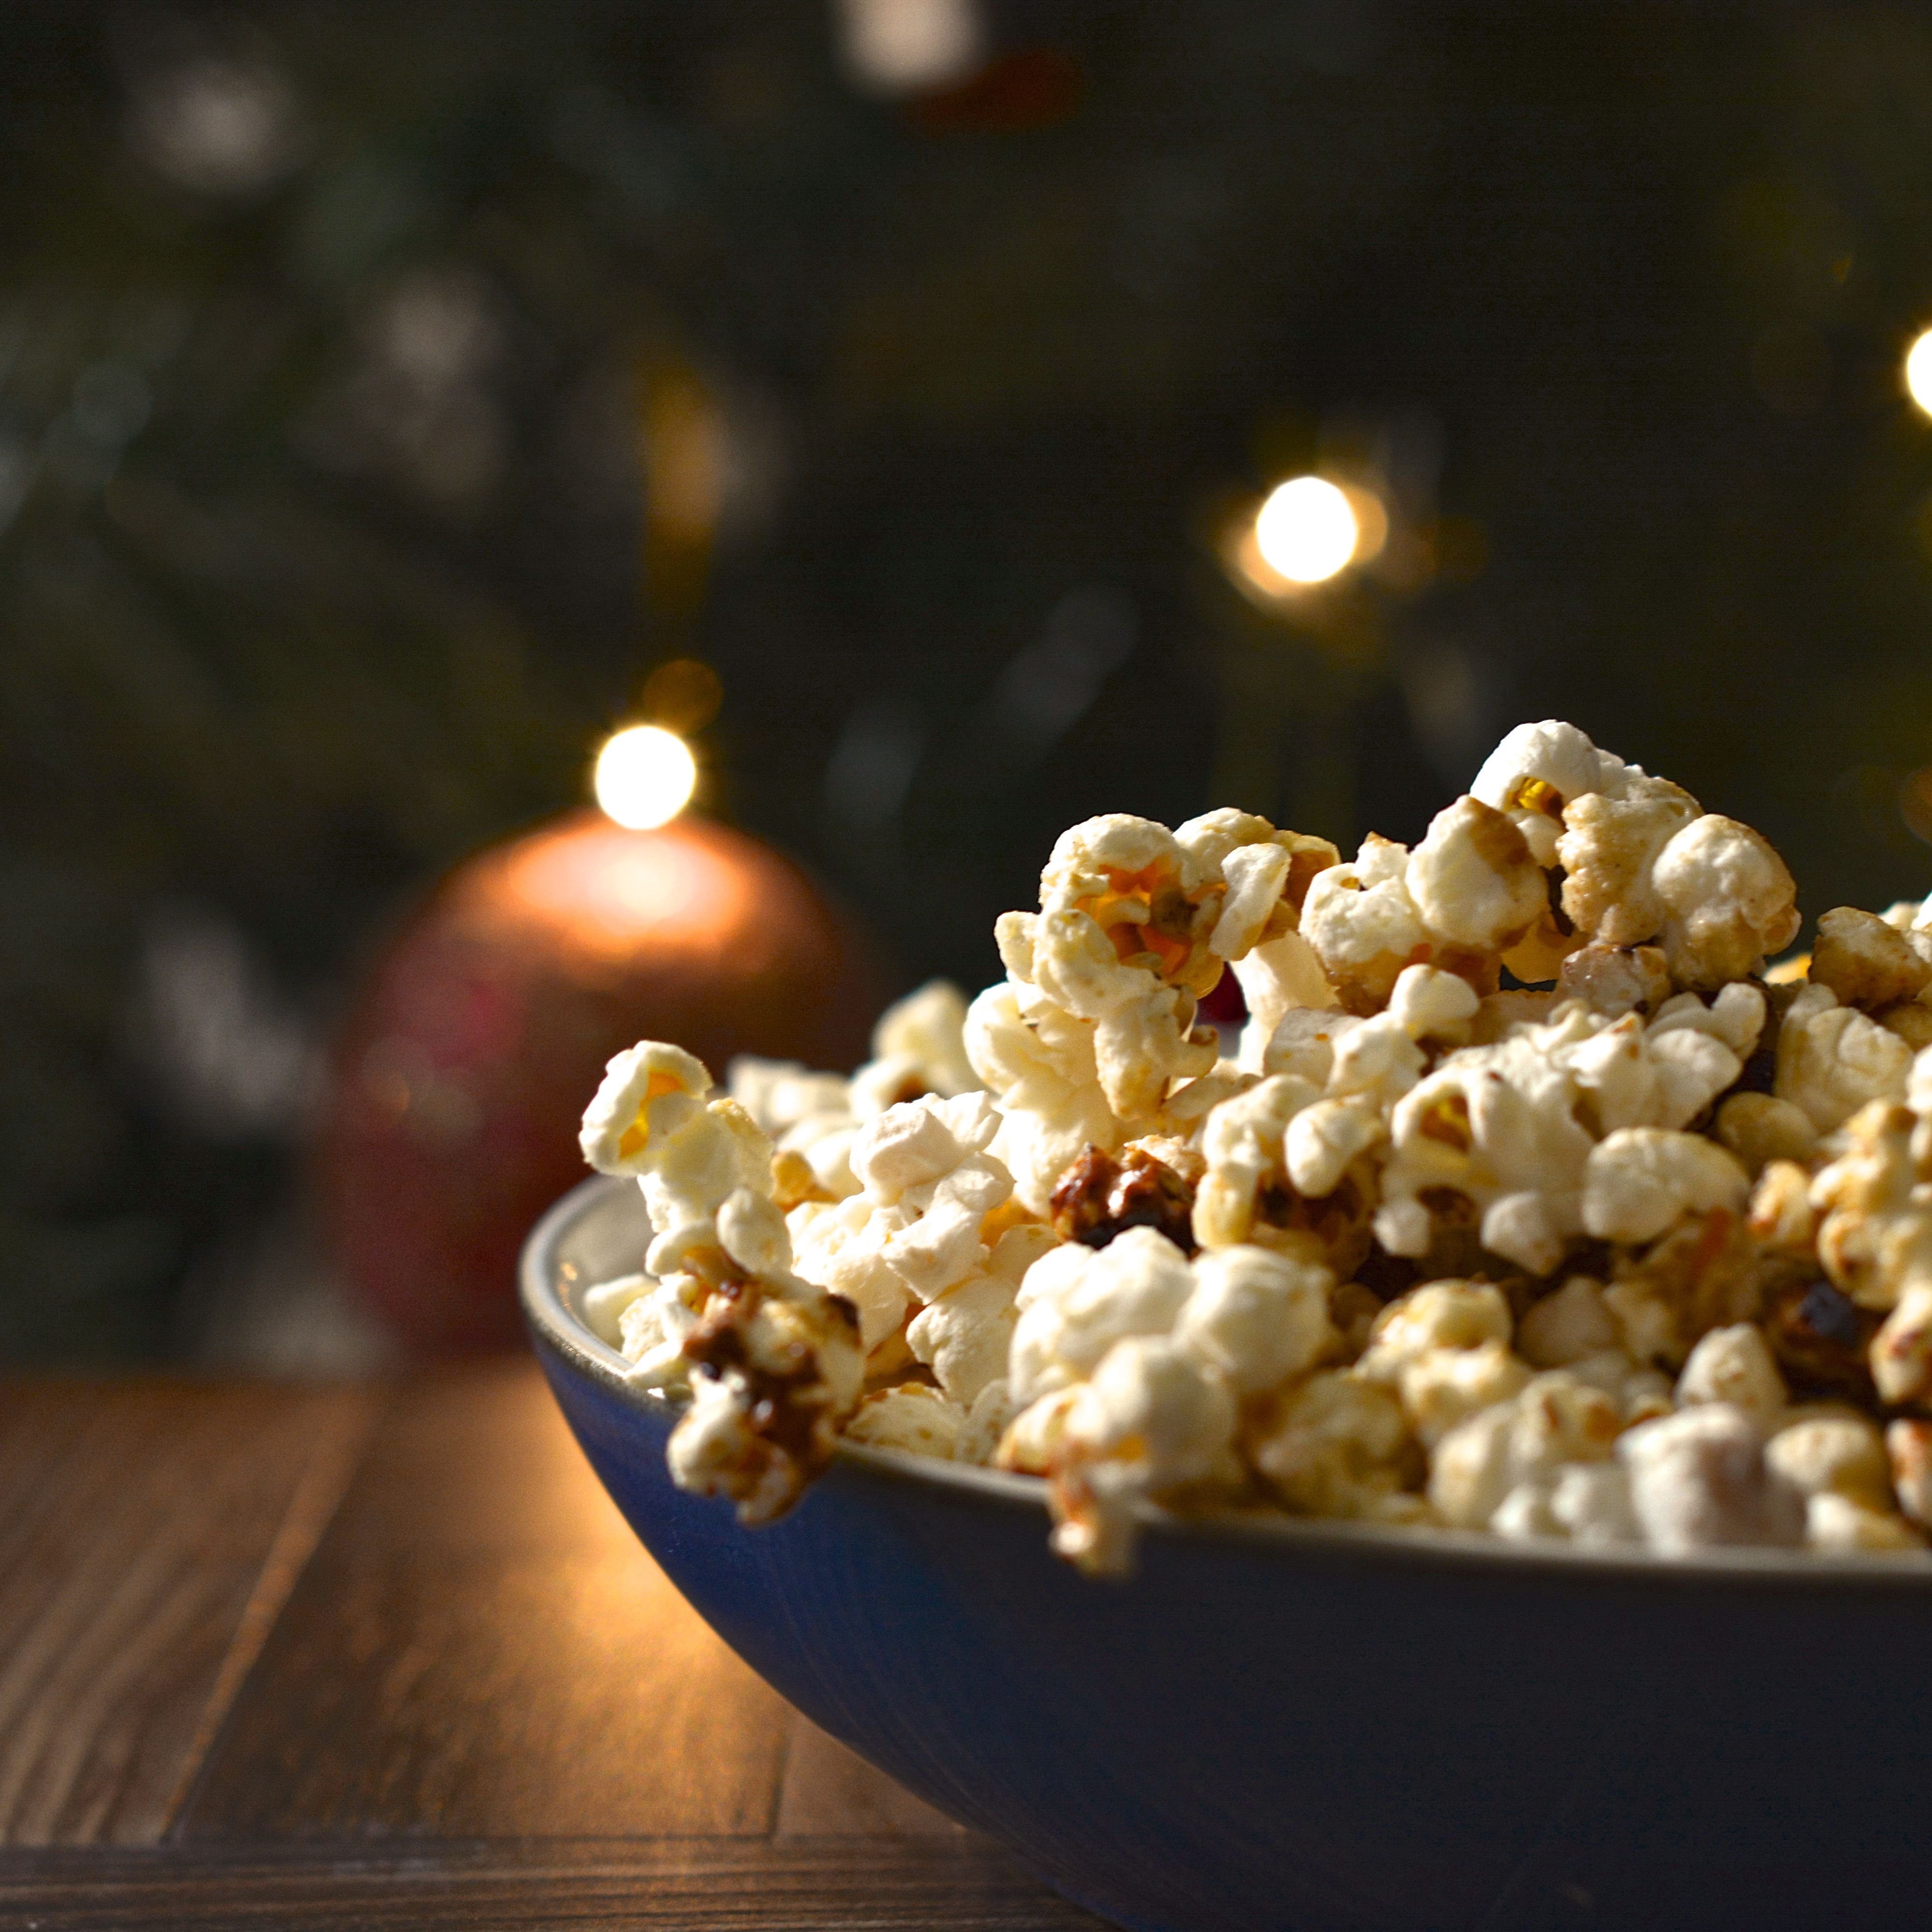 Spiced Orange Popcorn